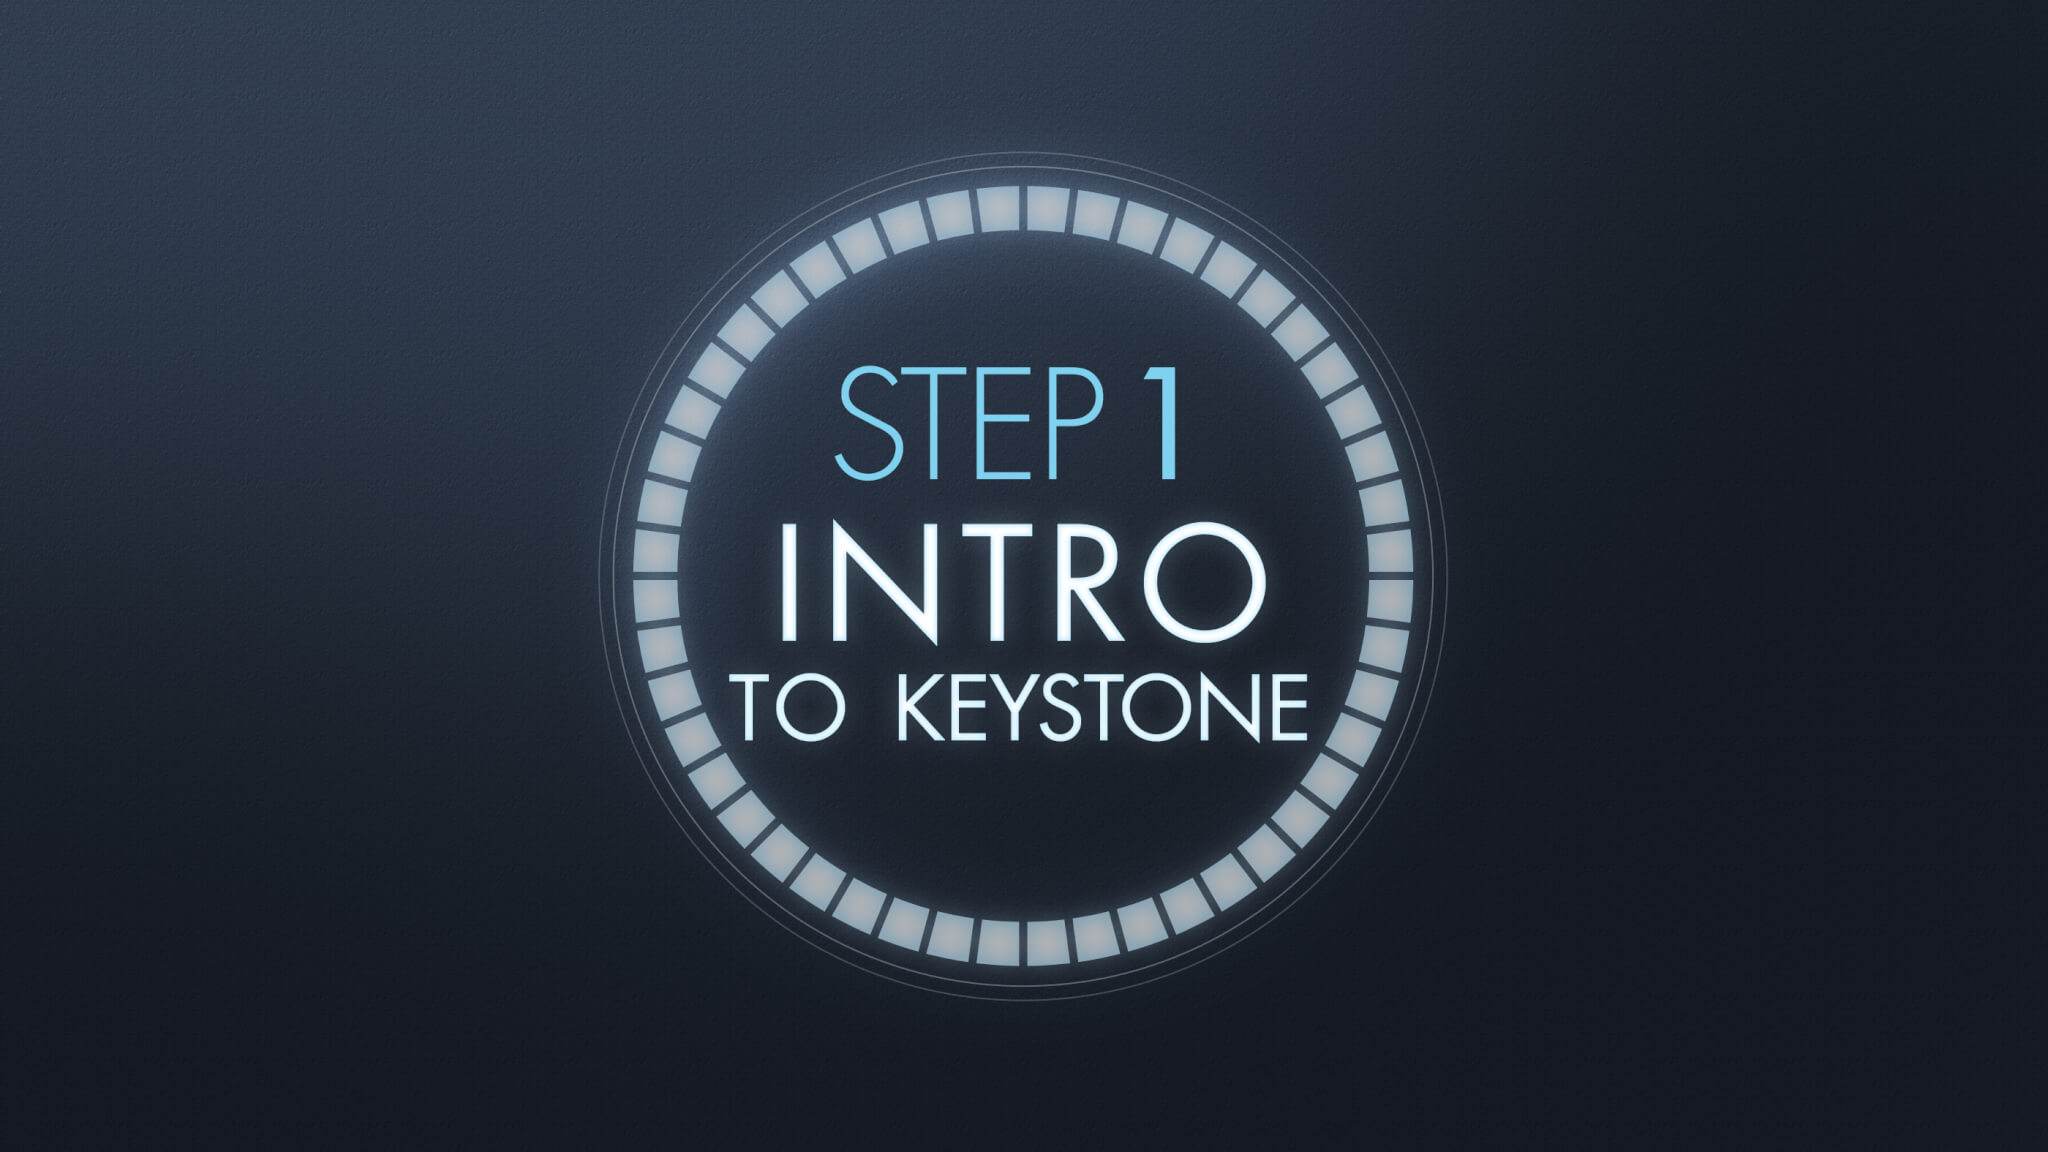 Step 1 - Intro